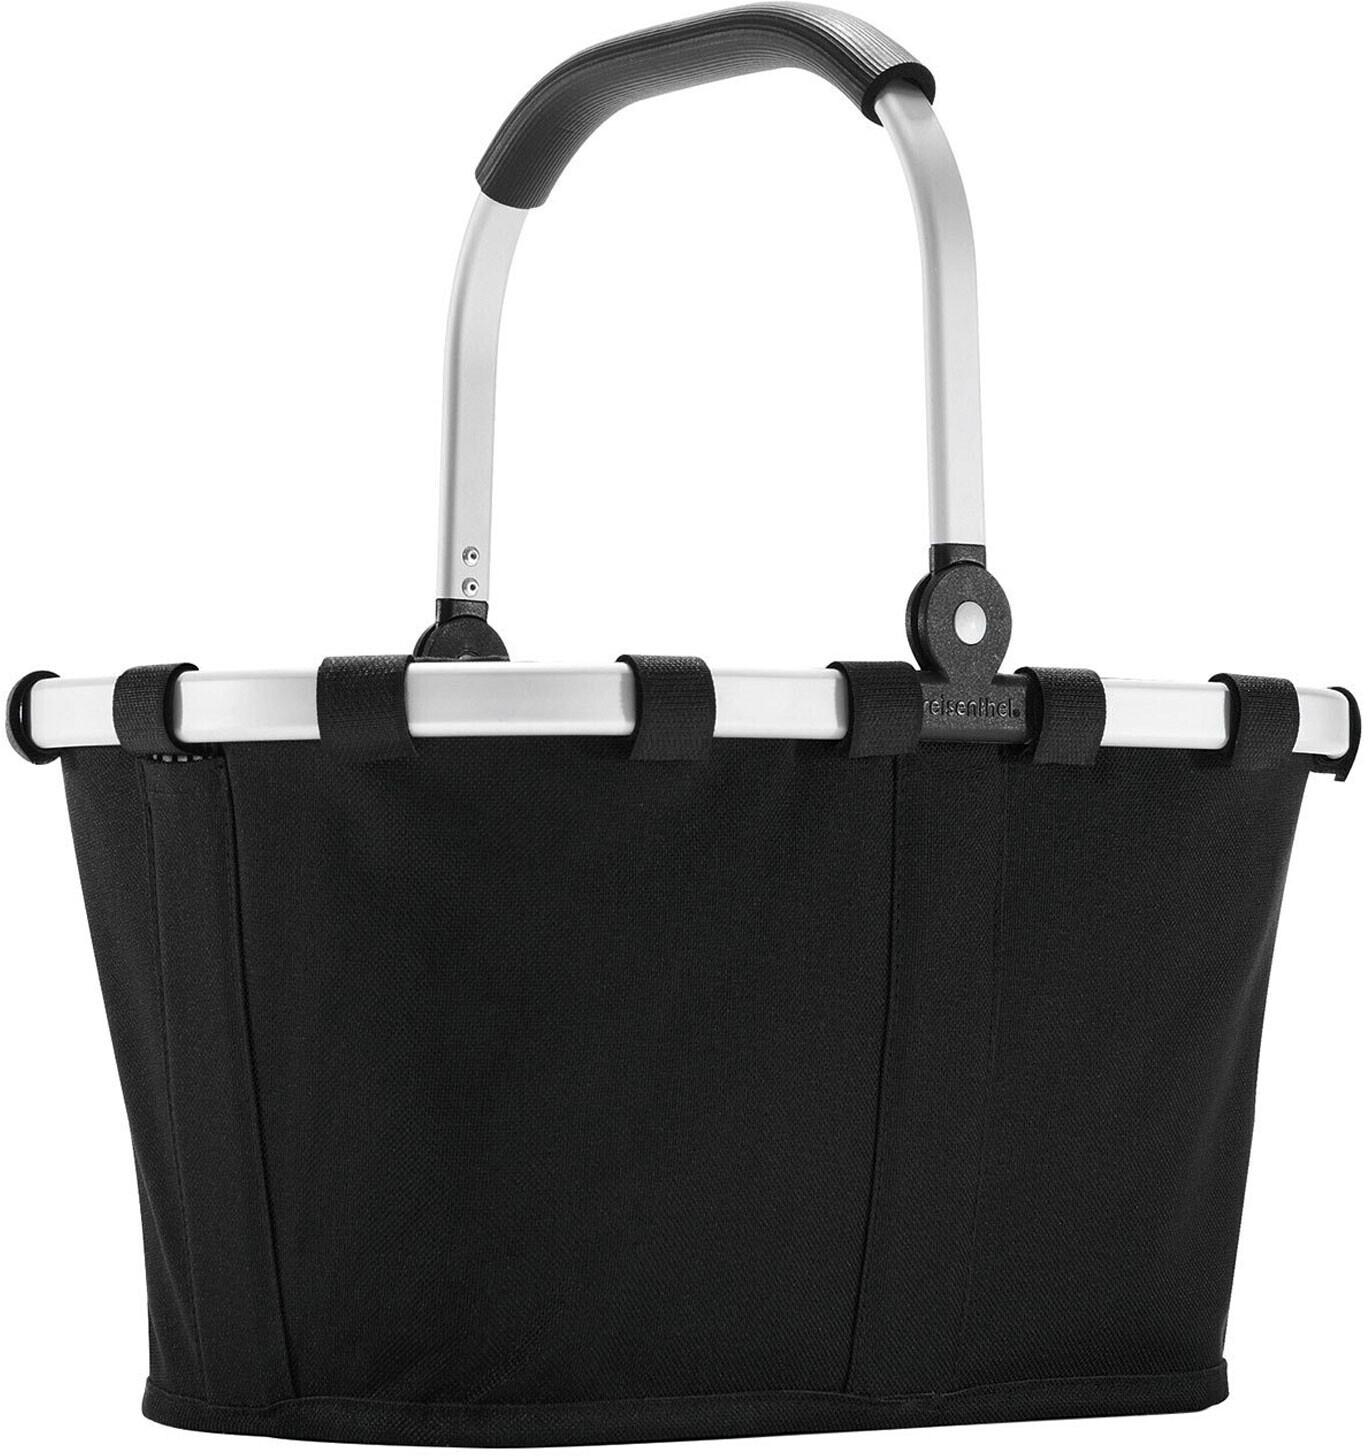 Reisenthel Carrybag XS